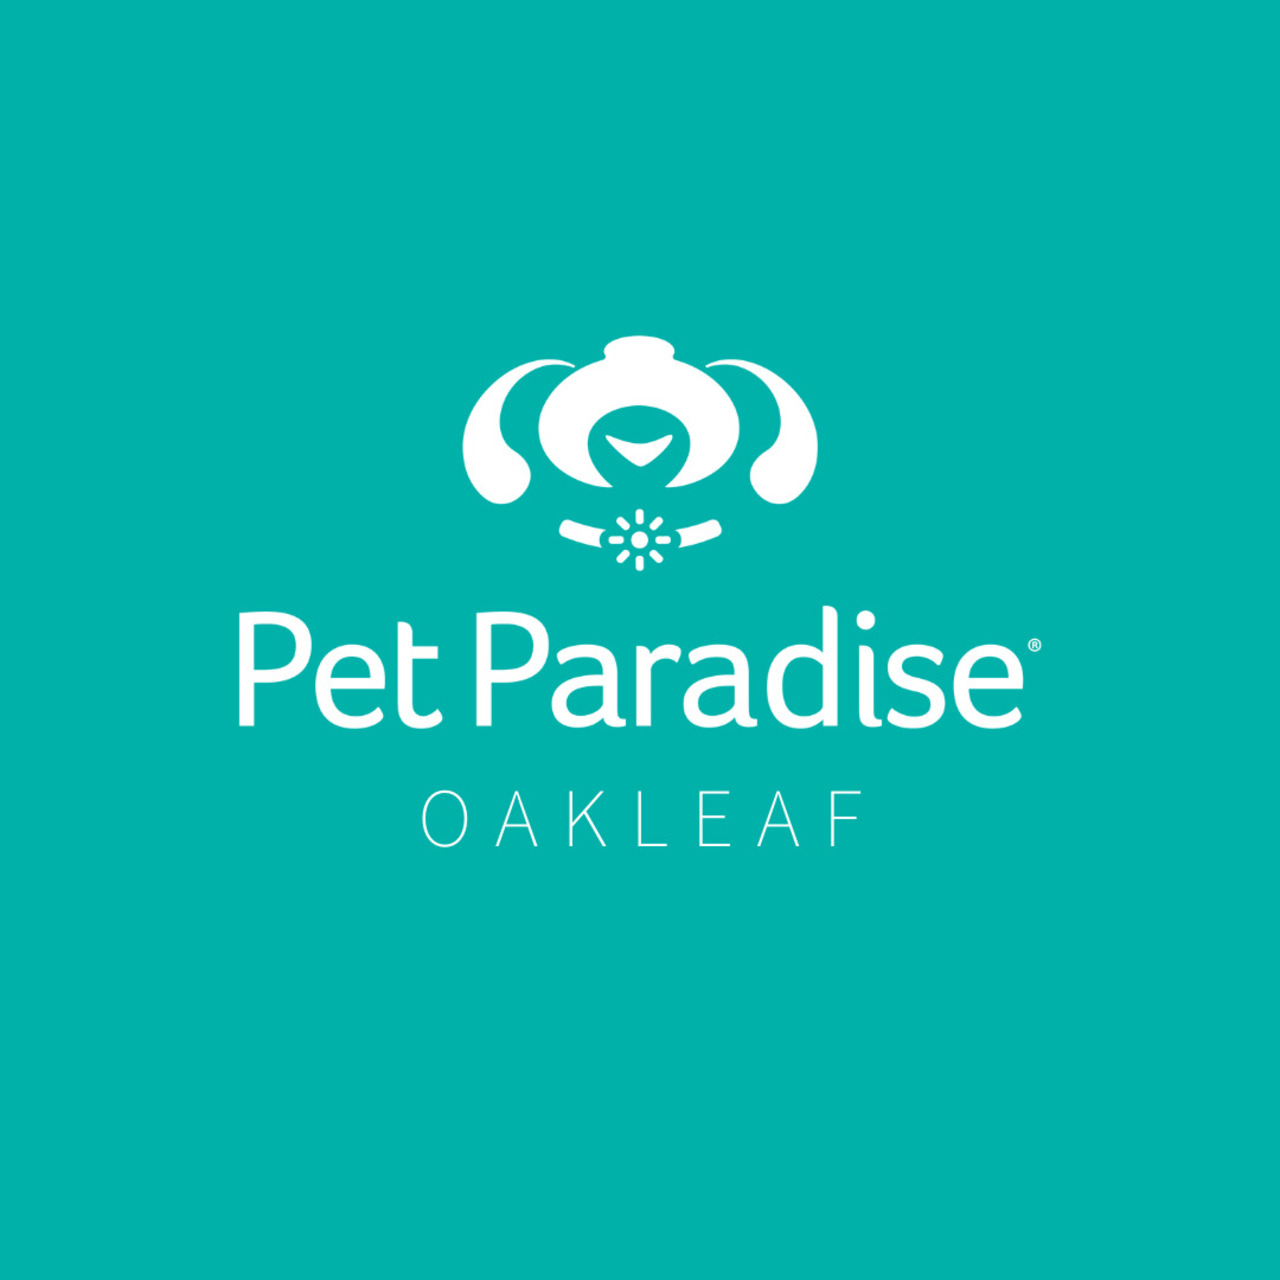 Pet Paradise Oakleaf